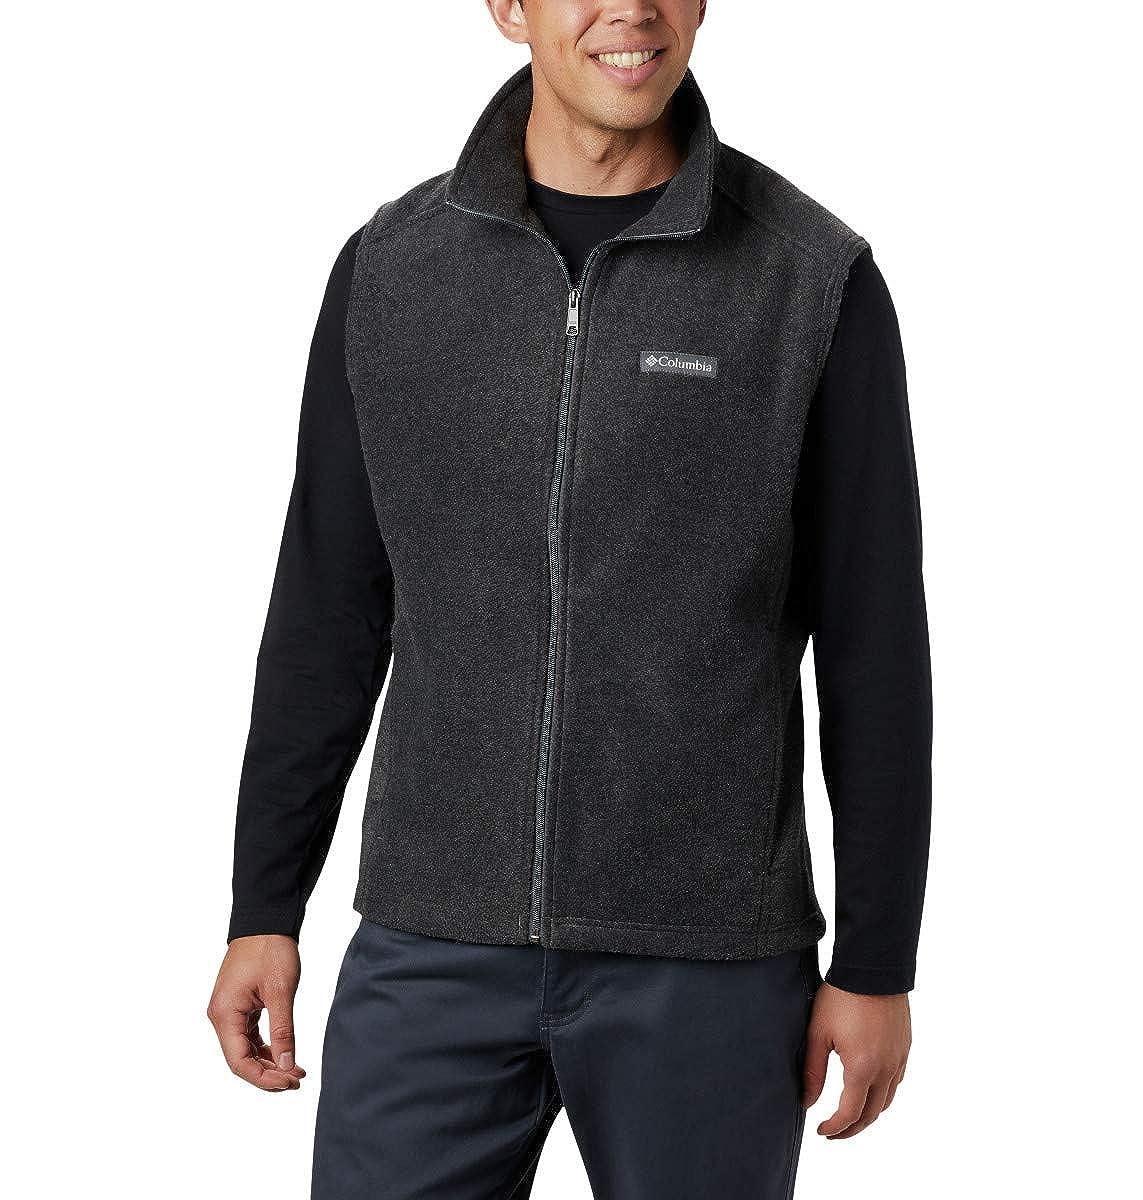 Columbia Mens Big /& Tall Cascades Explorer Full Zip Midweight Fleece Jacket